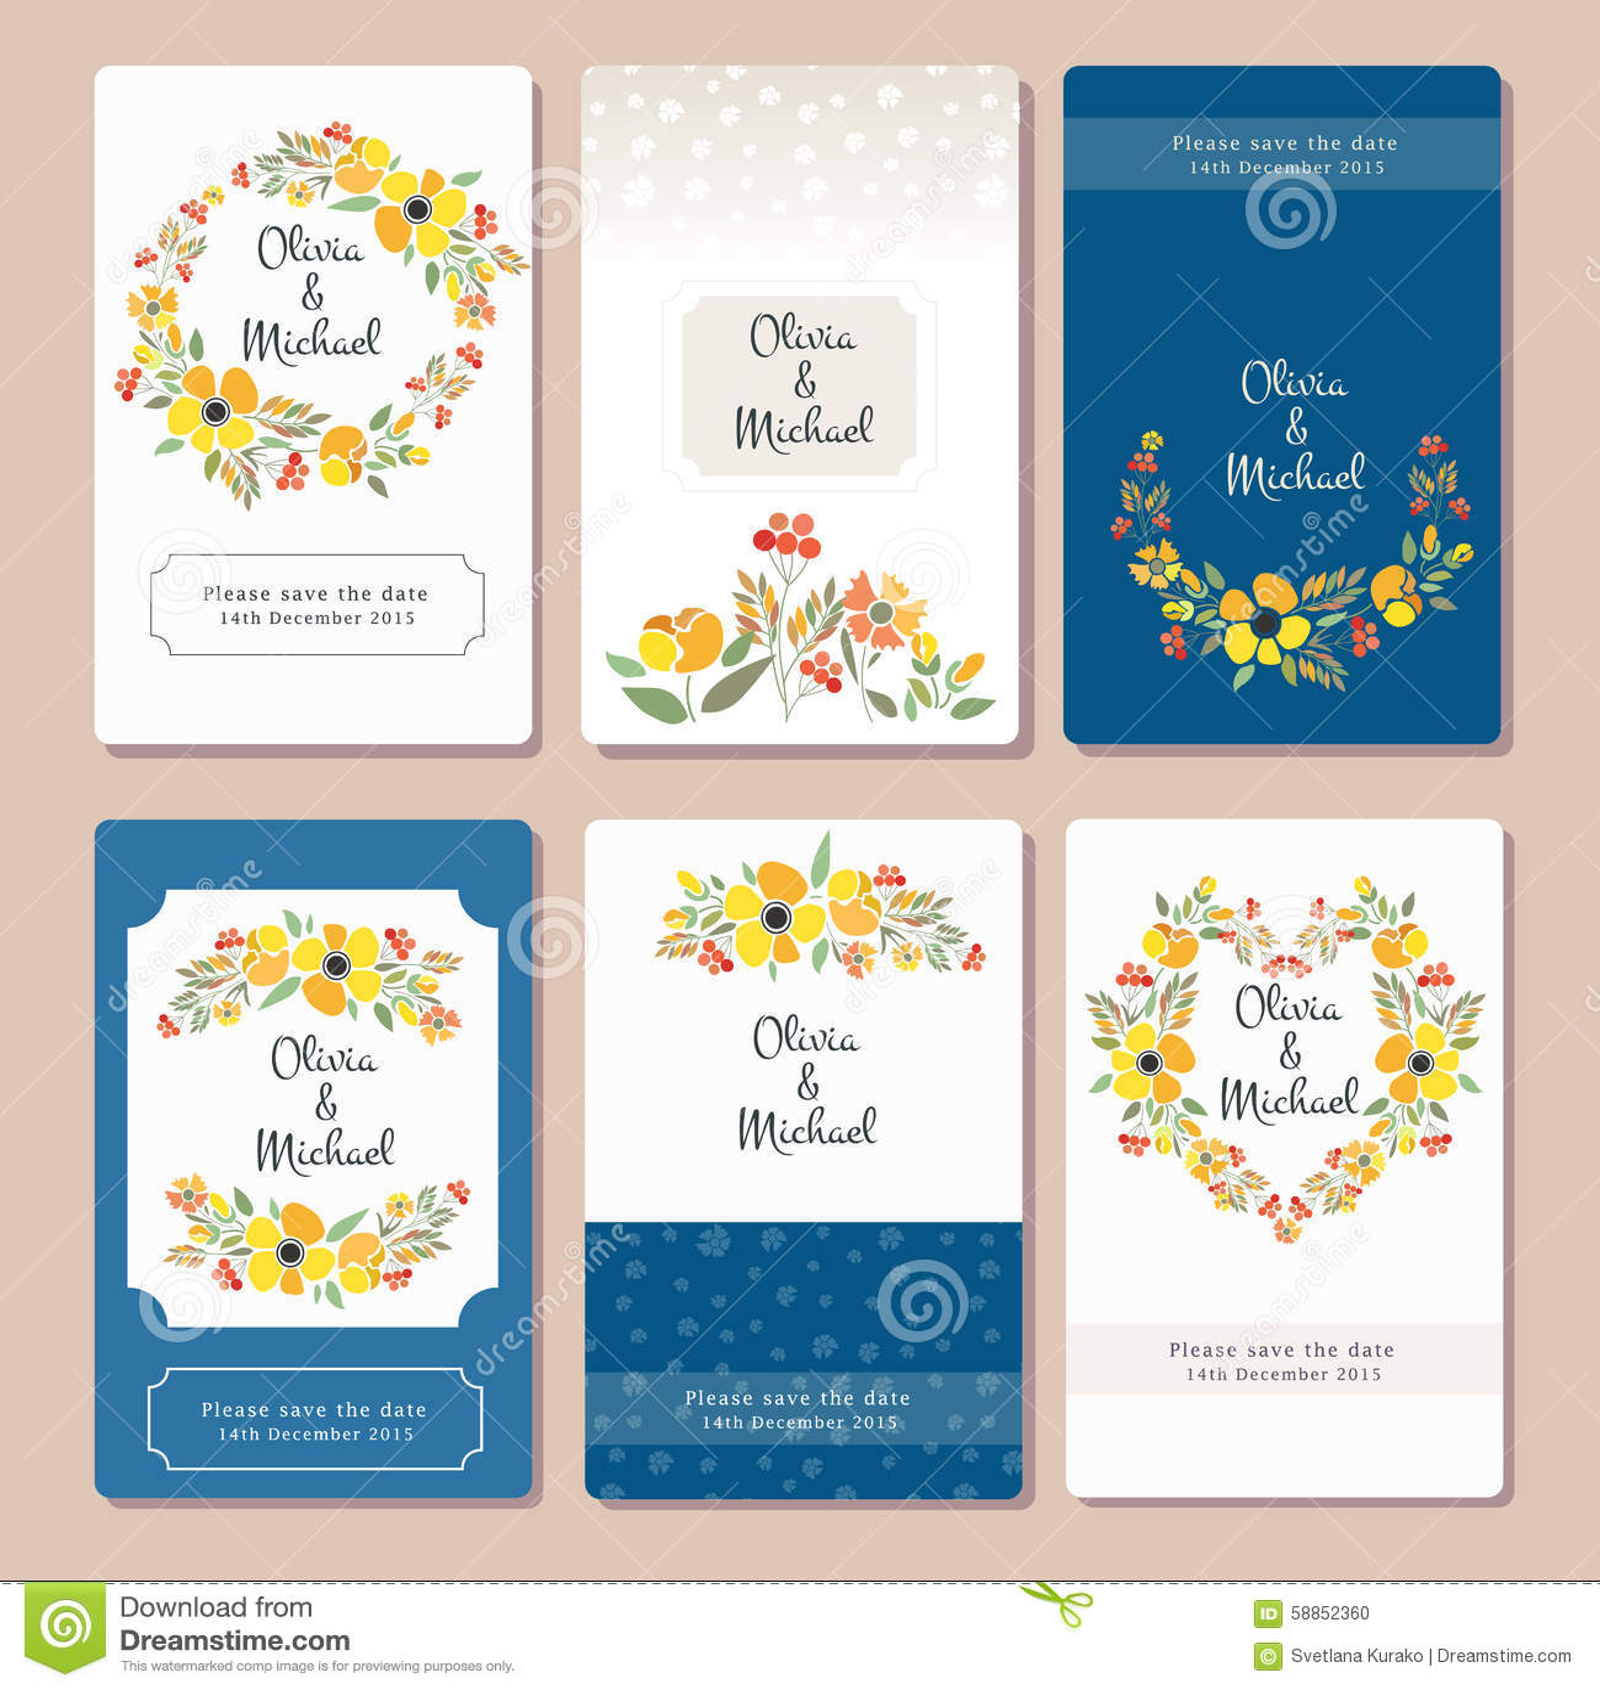 flower tags template free - autumn wedding graphic set stock illustration image